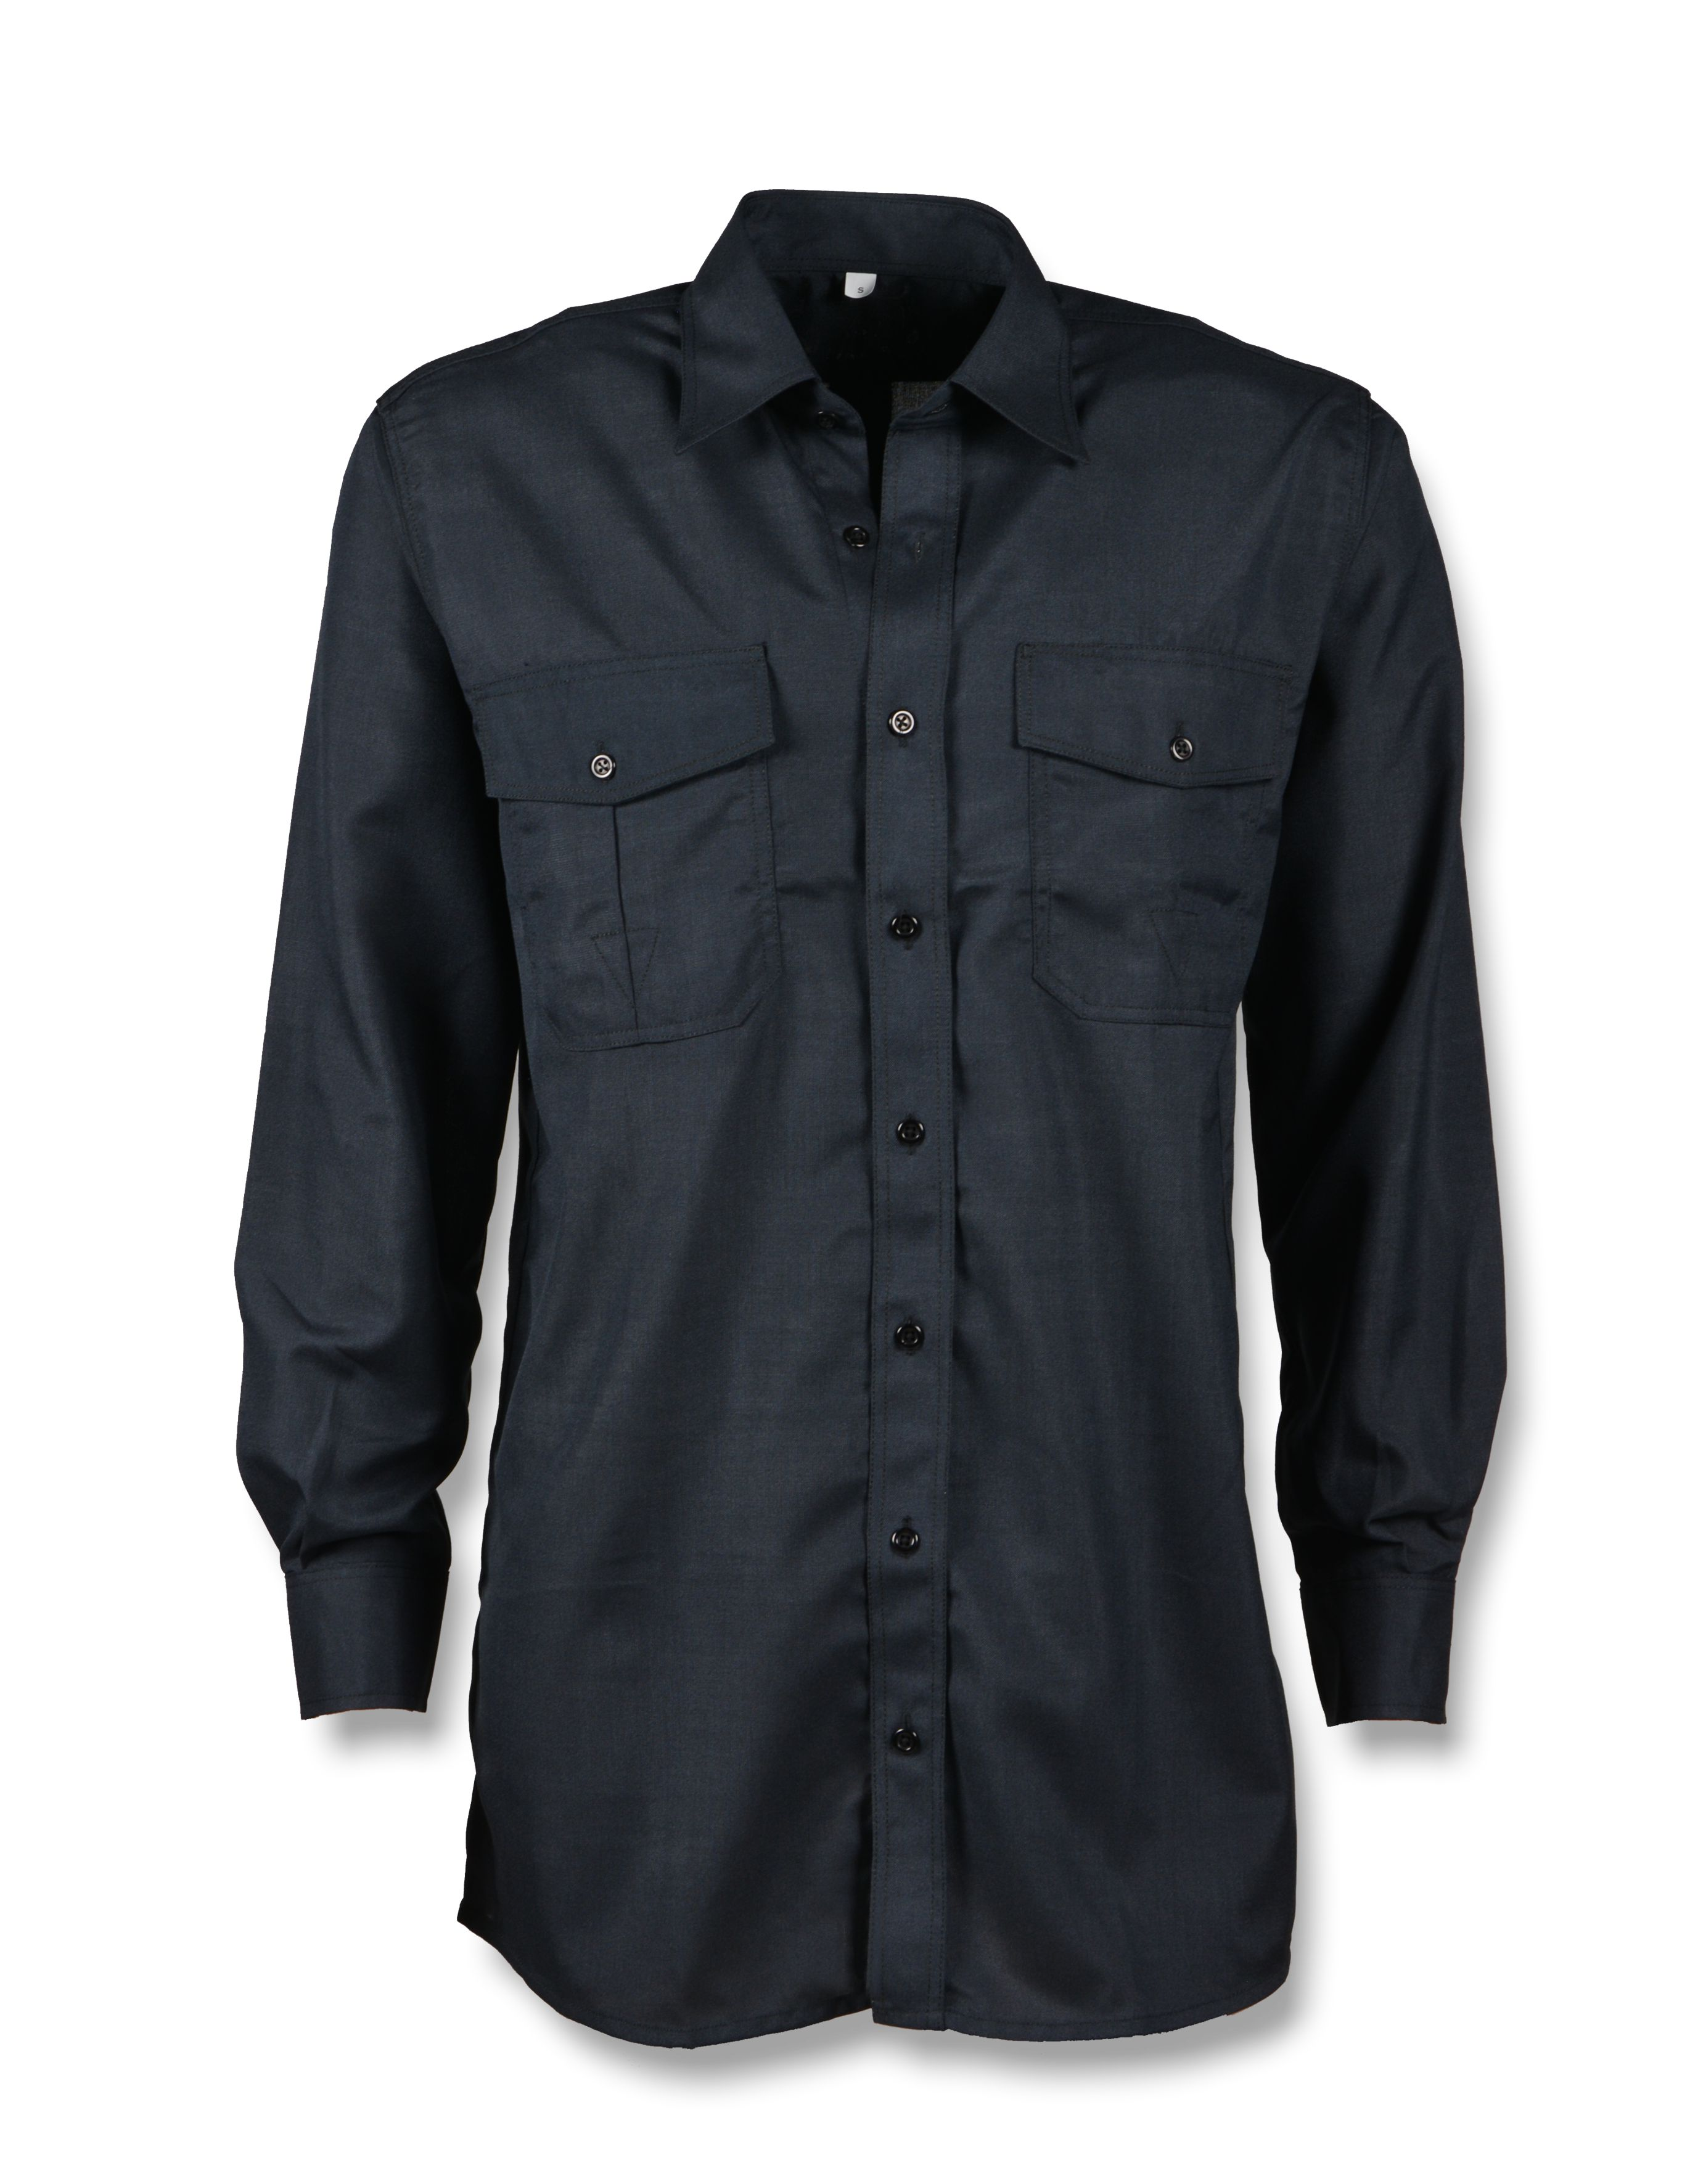 Het Overhemd.B204nxcbw Overhemd Lange Mouw Blauw Pwg Veiligheidskleding